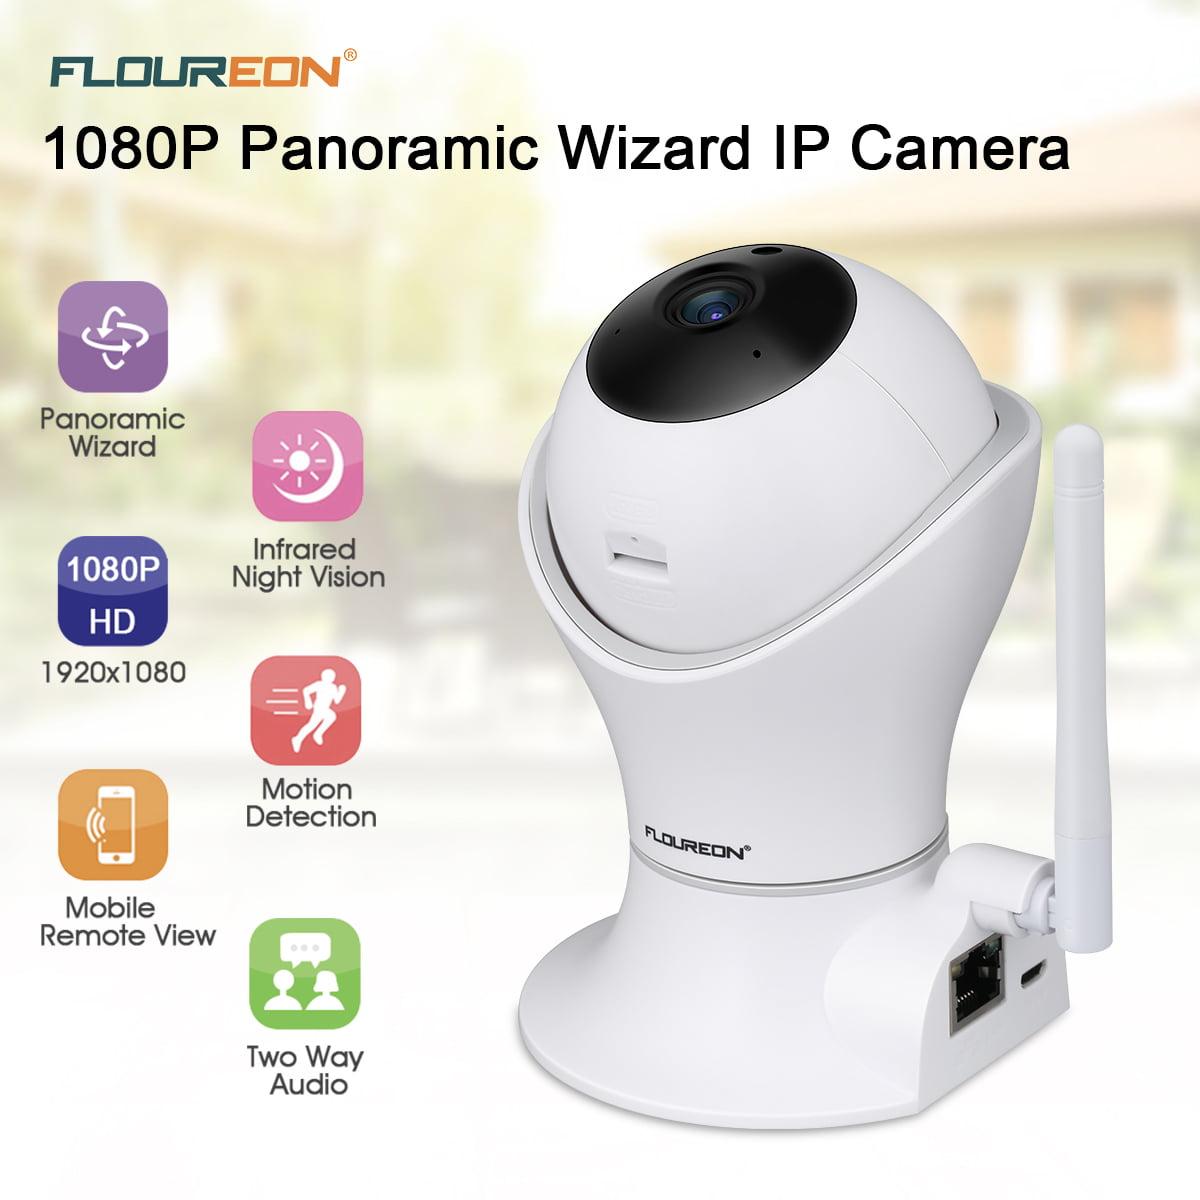 FLOUREON WiFi Wireless Security Camera, 1080P H.264 Wifi 2.0 Megapixel Wireless CCTV Security IP Camera TF Slot